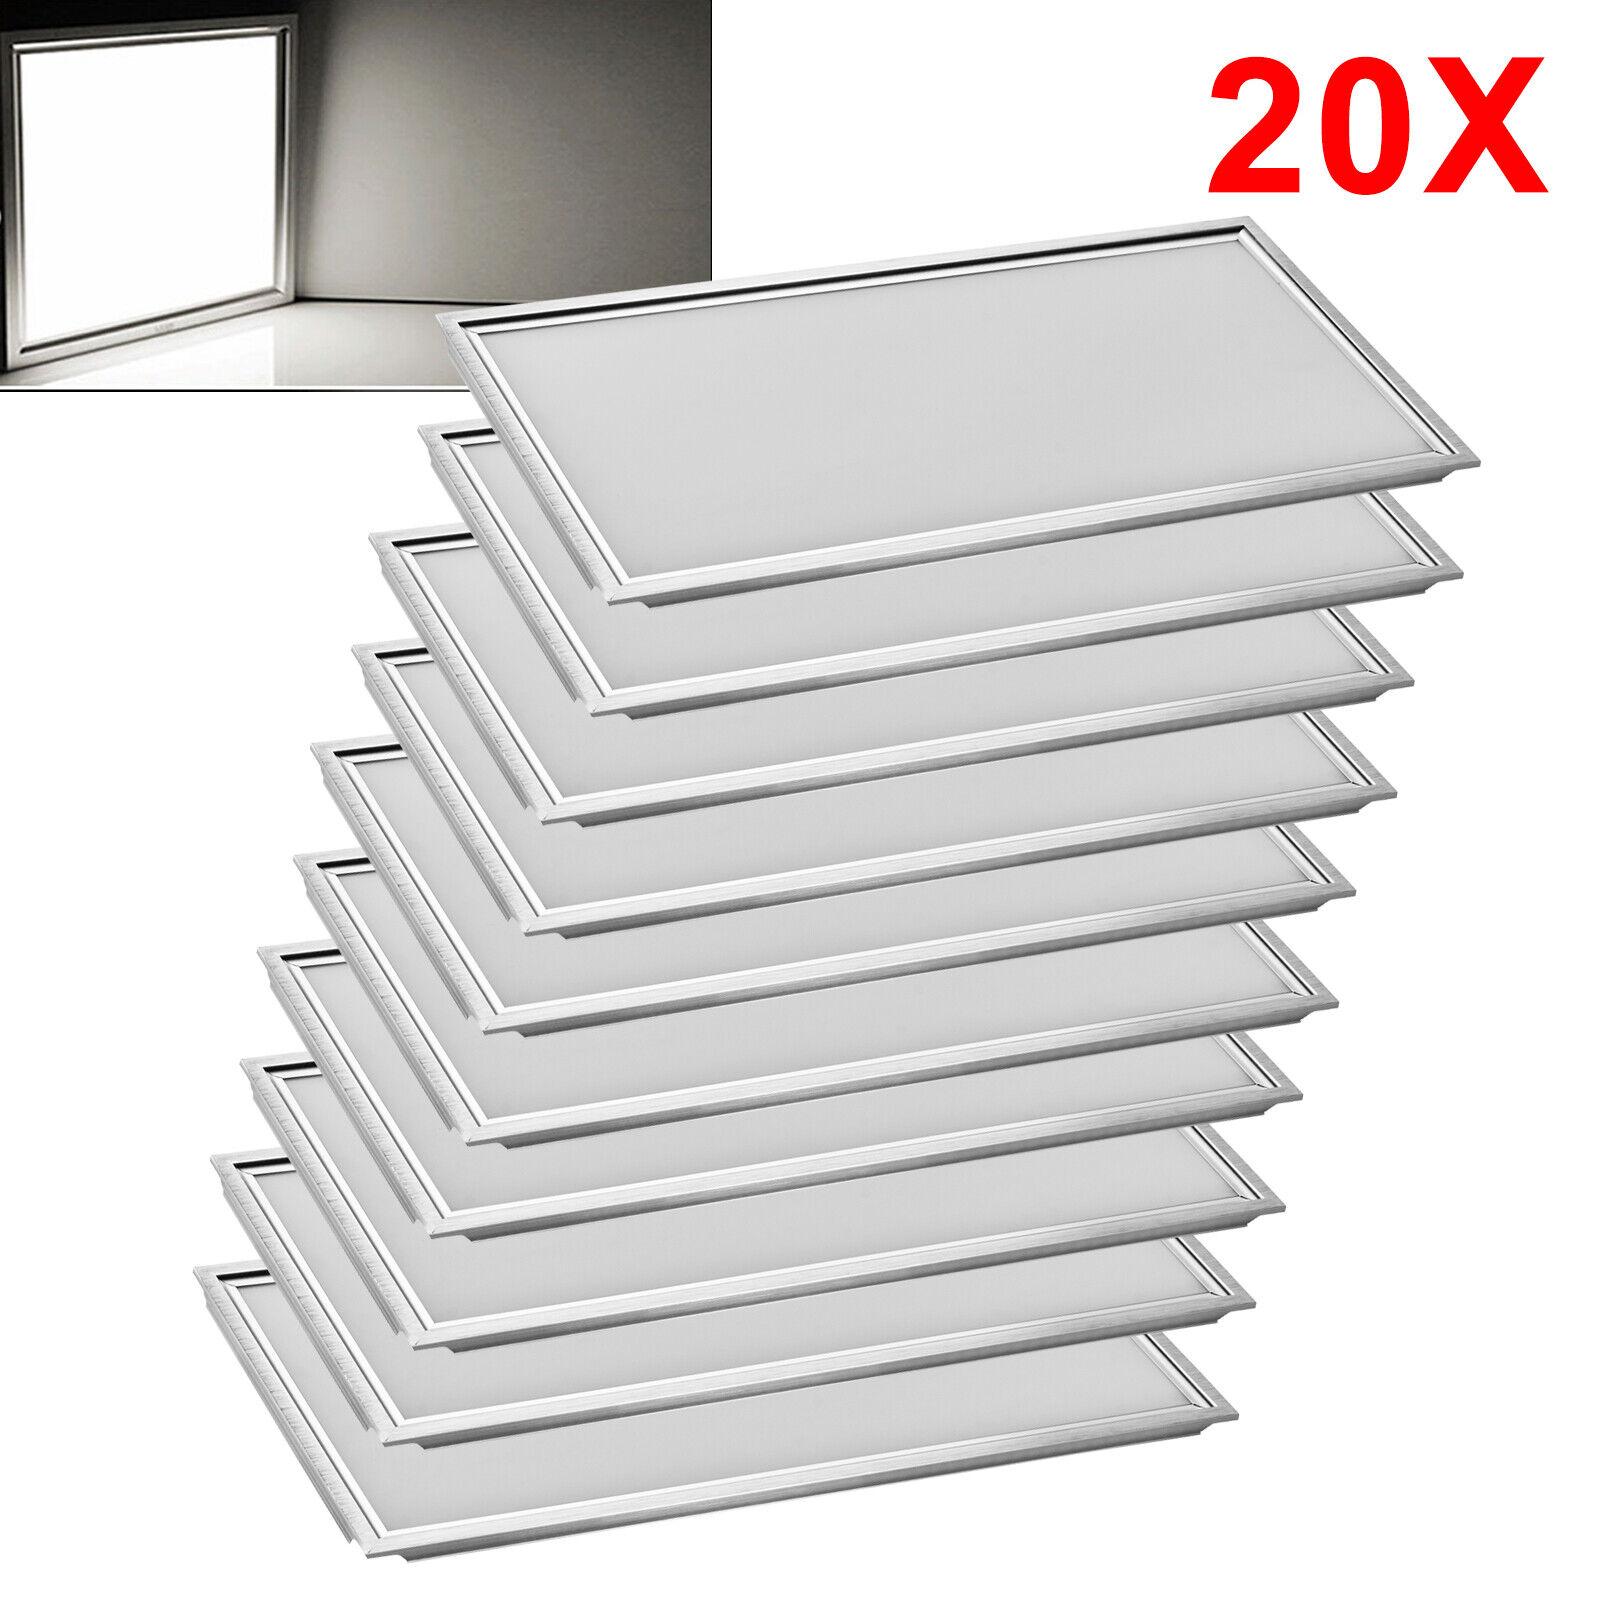 20x LED Panel ultra slim neutral blancoo plafón instalación lámpara emisor 60x30cm